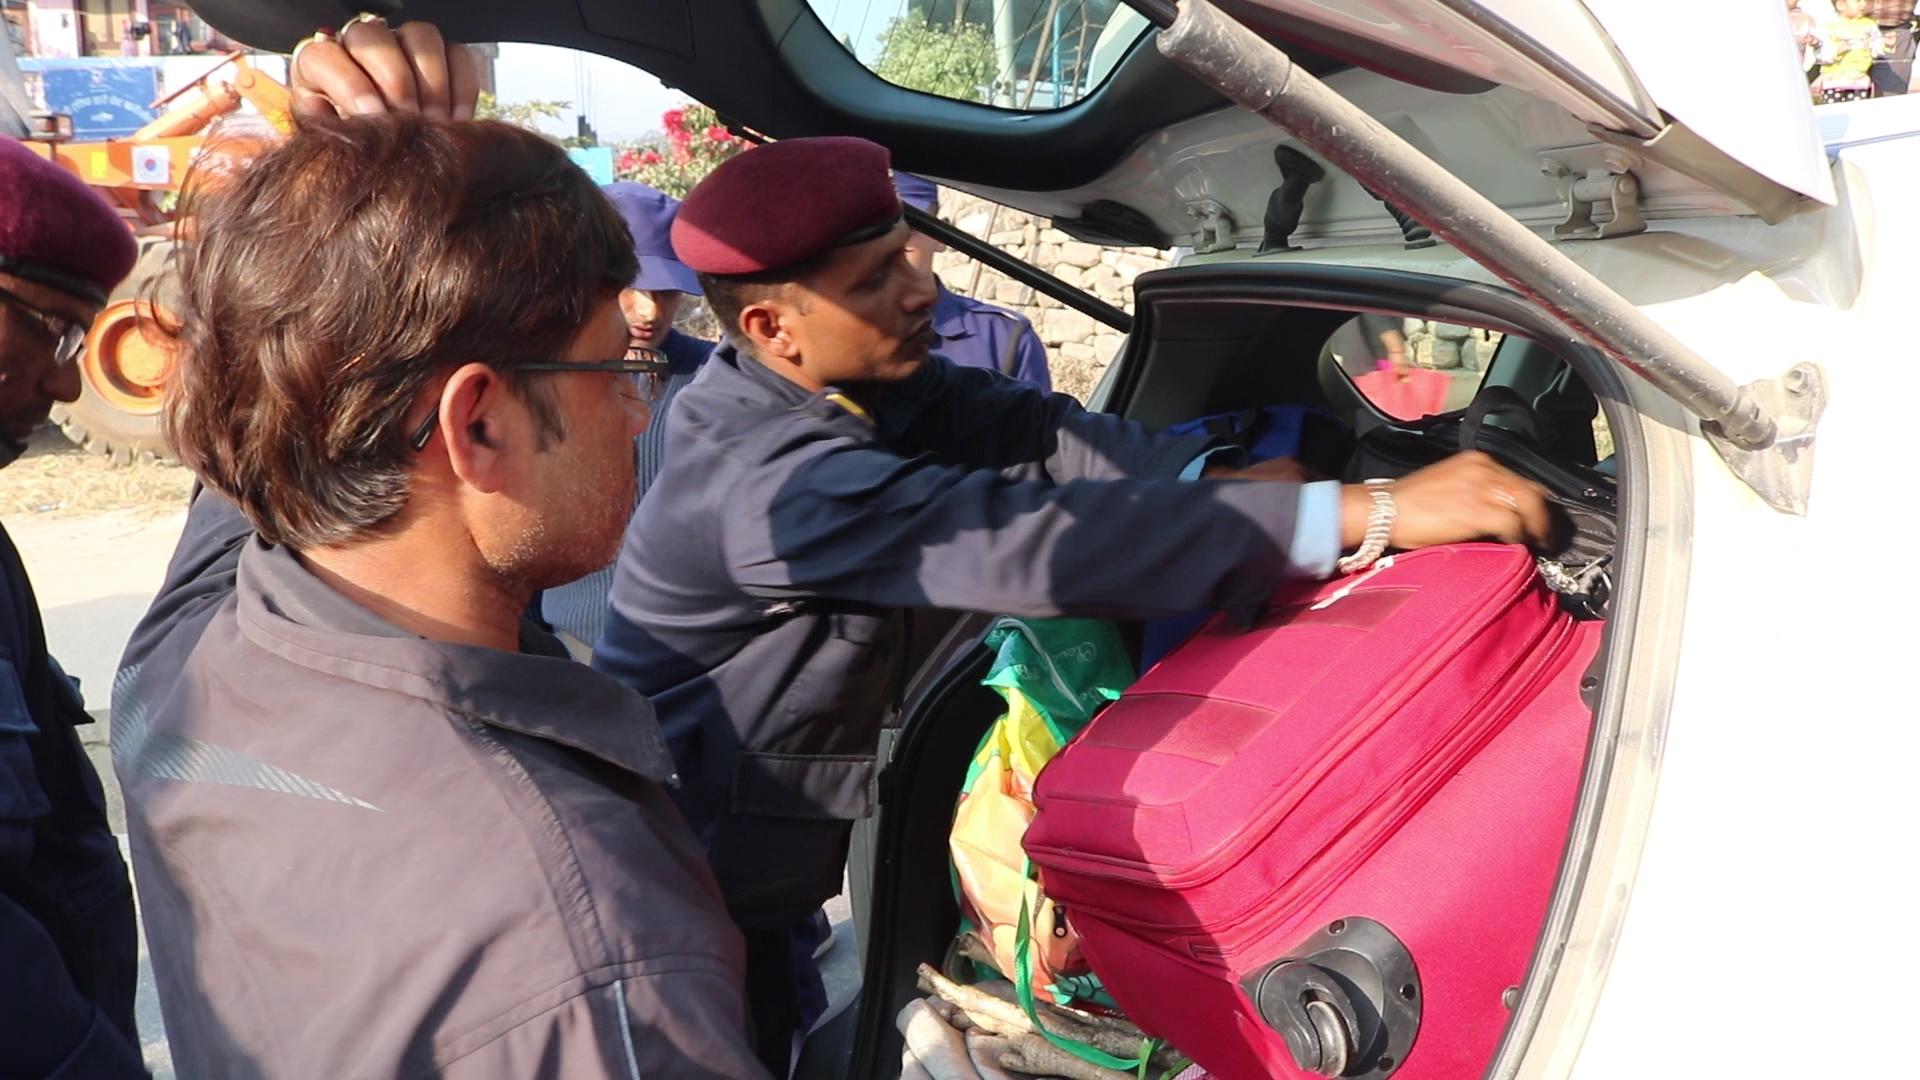 Police tighten security check in highways